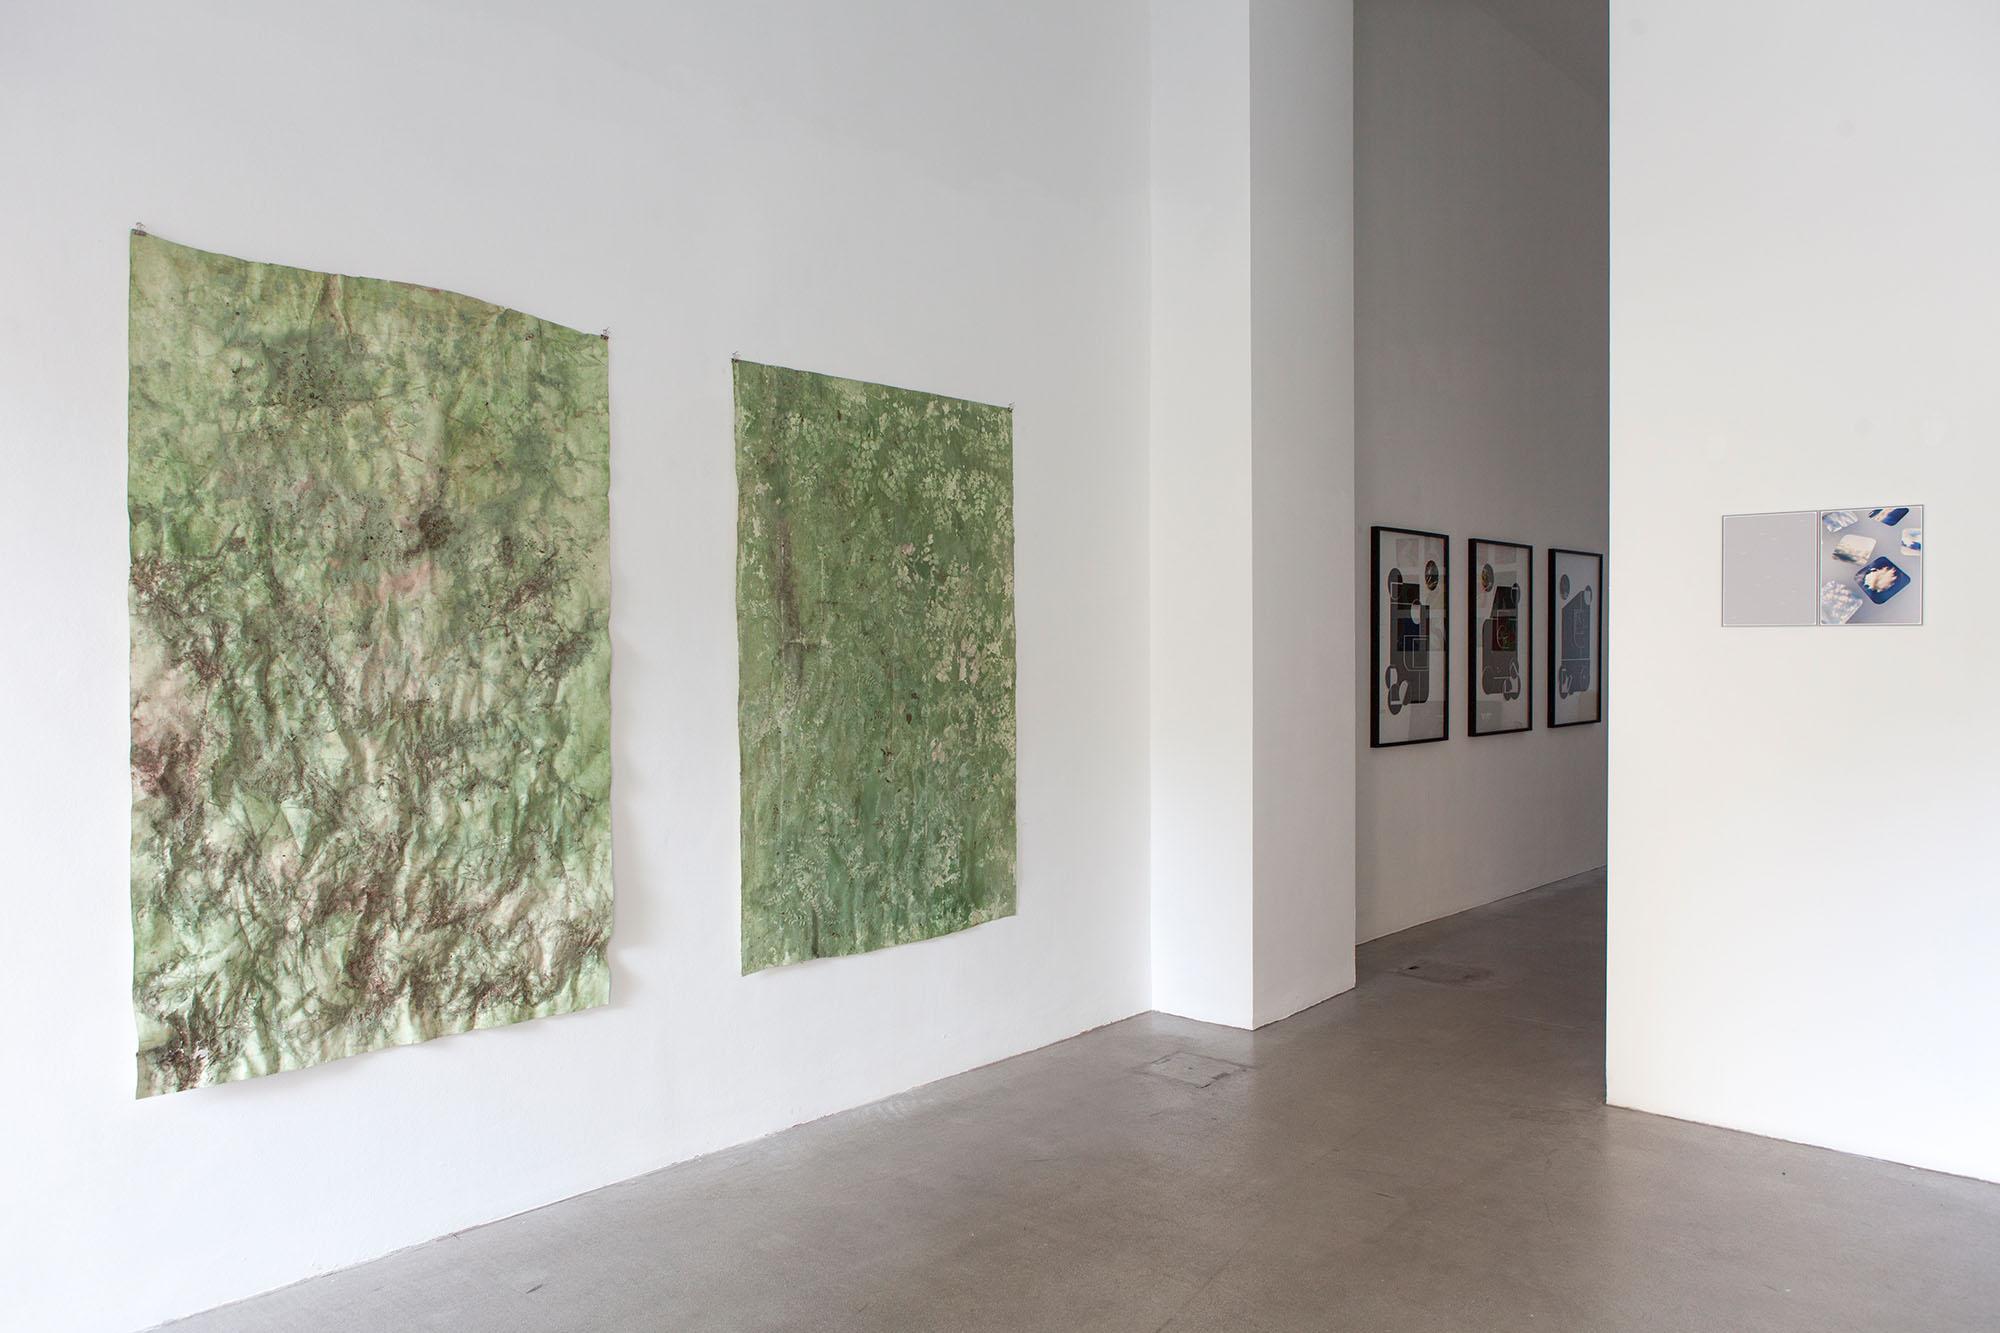 fine arts, university applied arts vienna, modern artworks